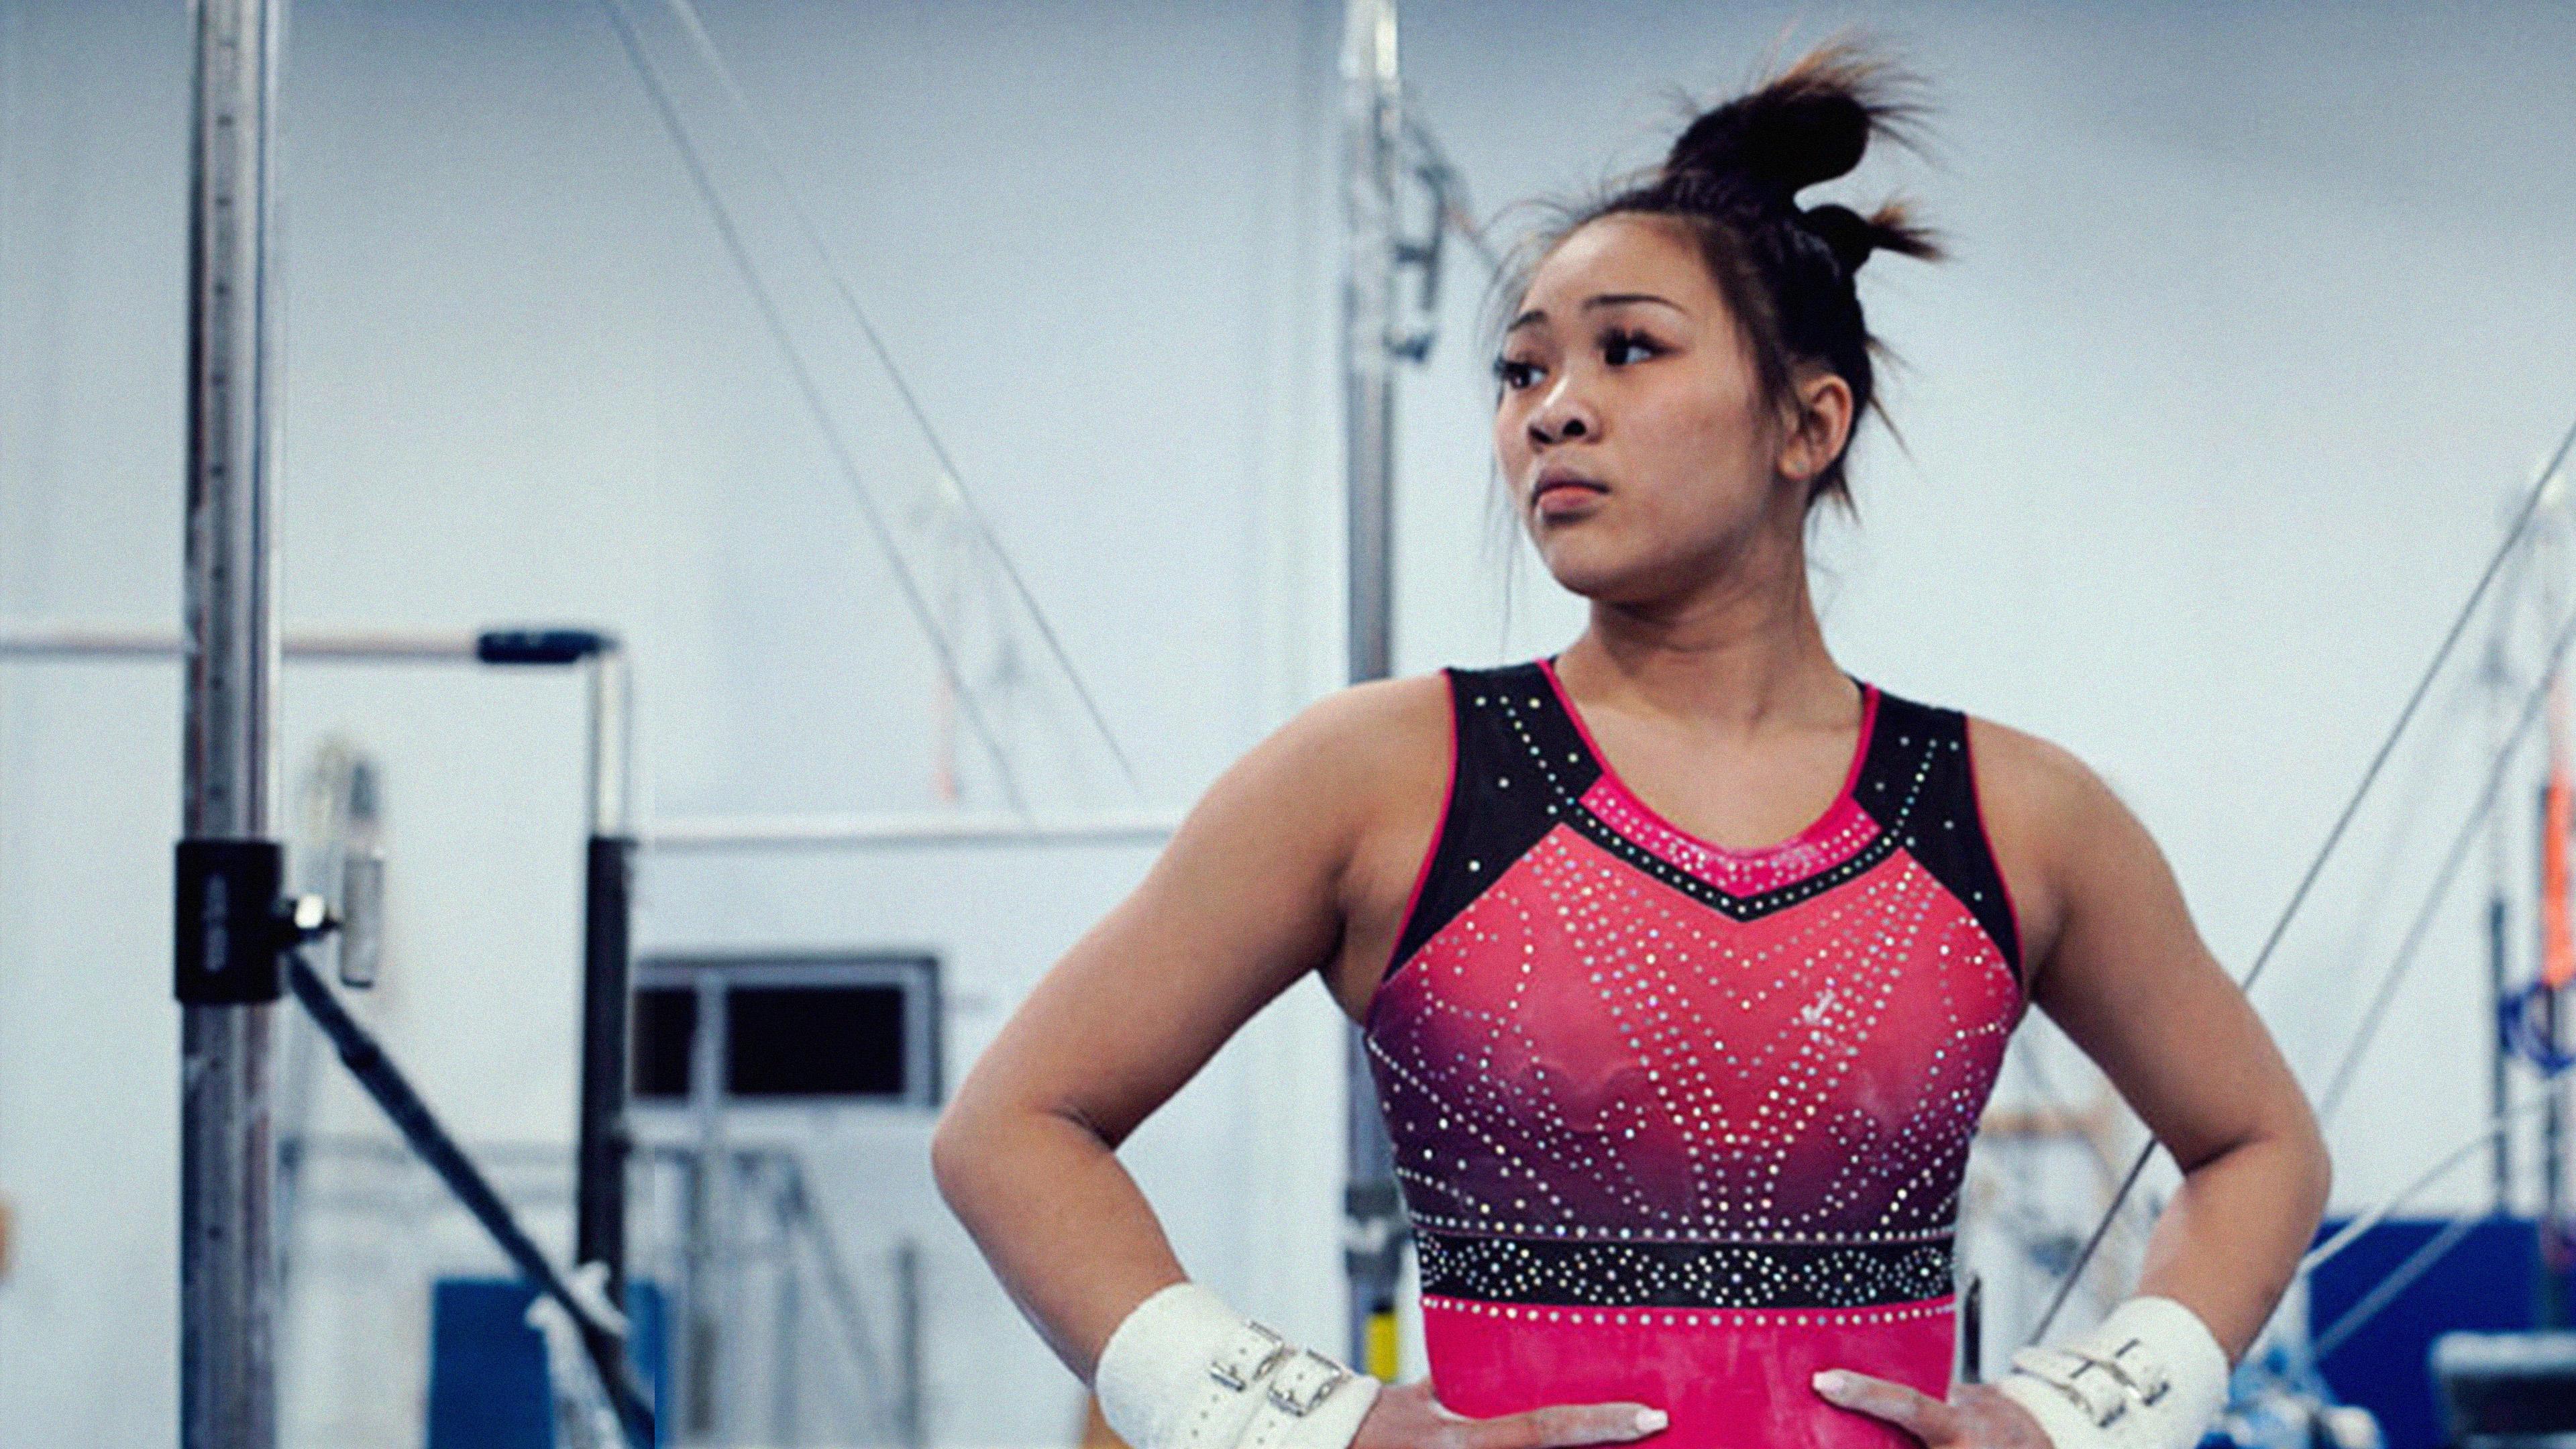 Watch Golden: The Journey of USA's Elite Gymnasts Online | Peacock